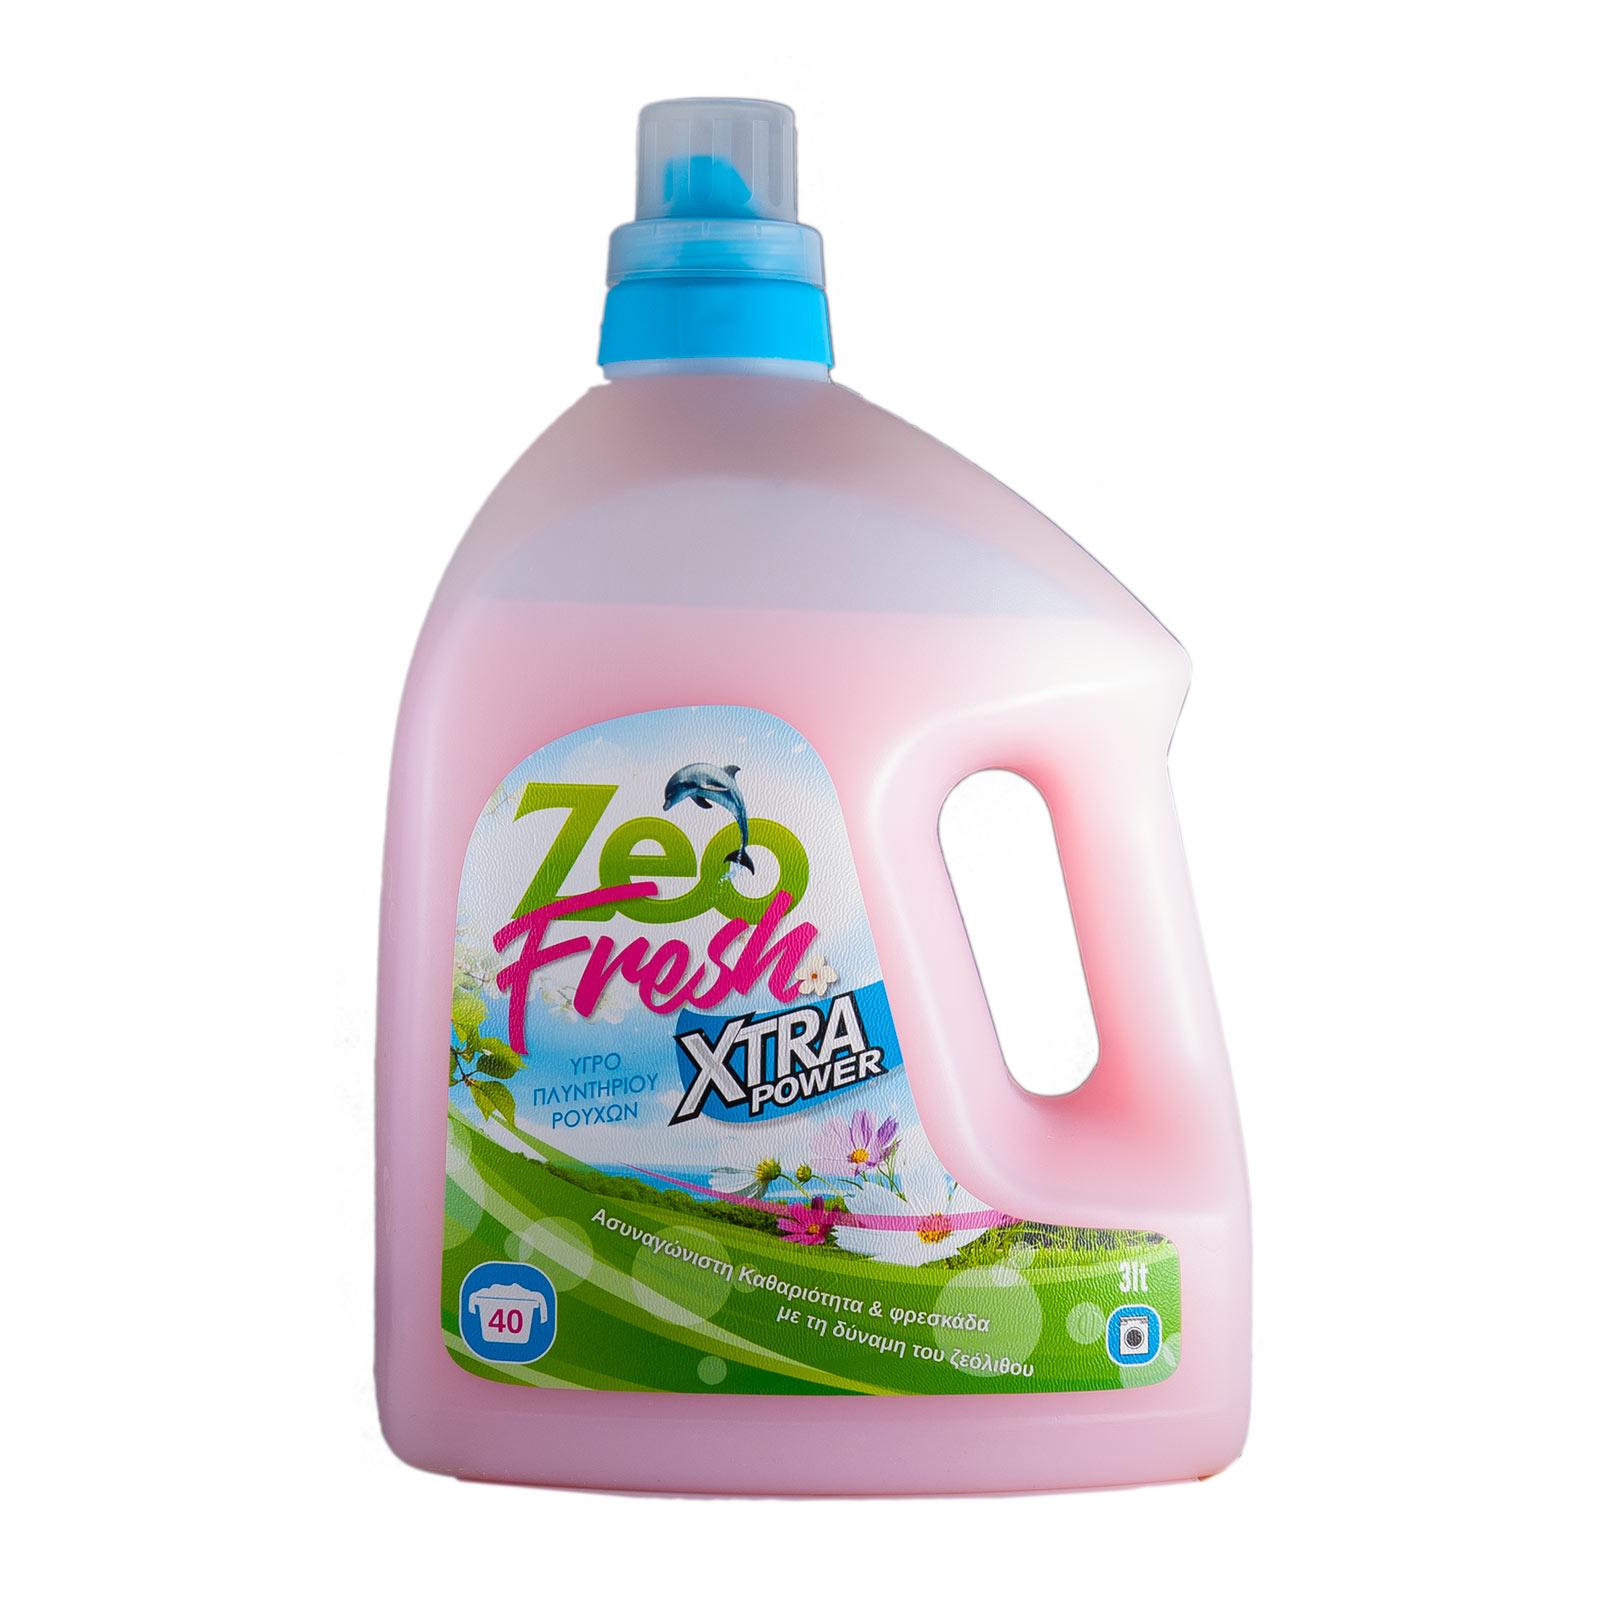 ZeoFresh – Υγρό απορρυπαντικό πλυντηρίου ρούχων – 3 λίτρα